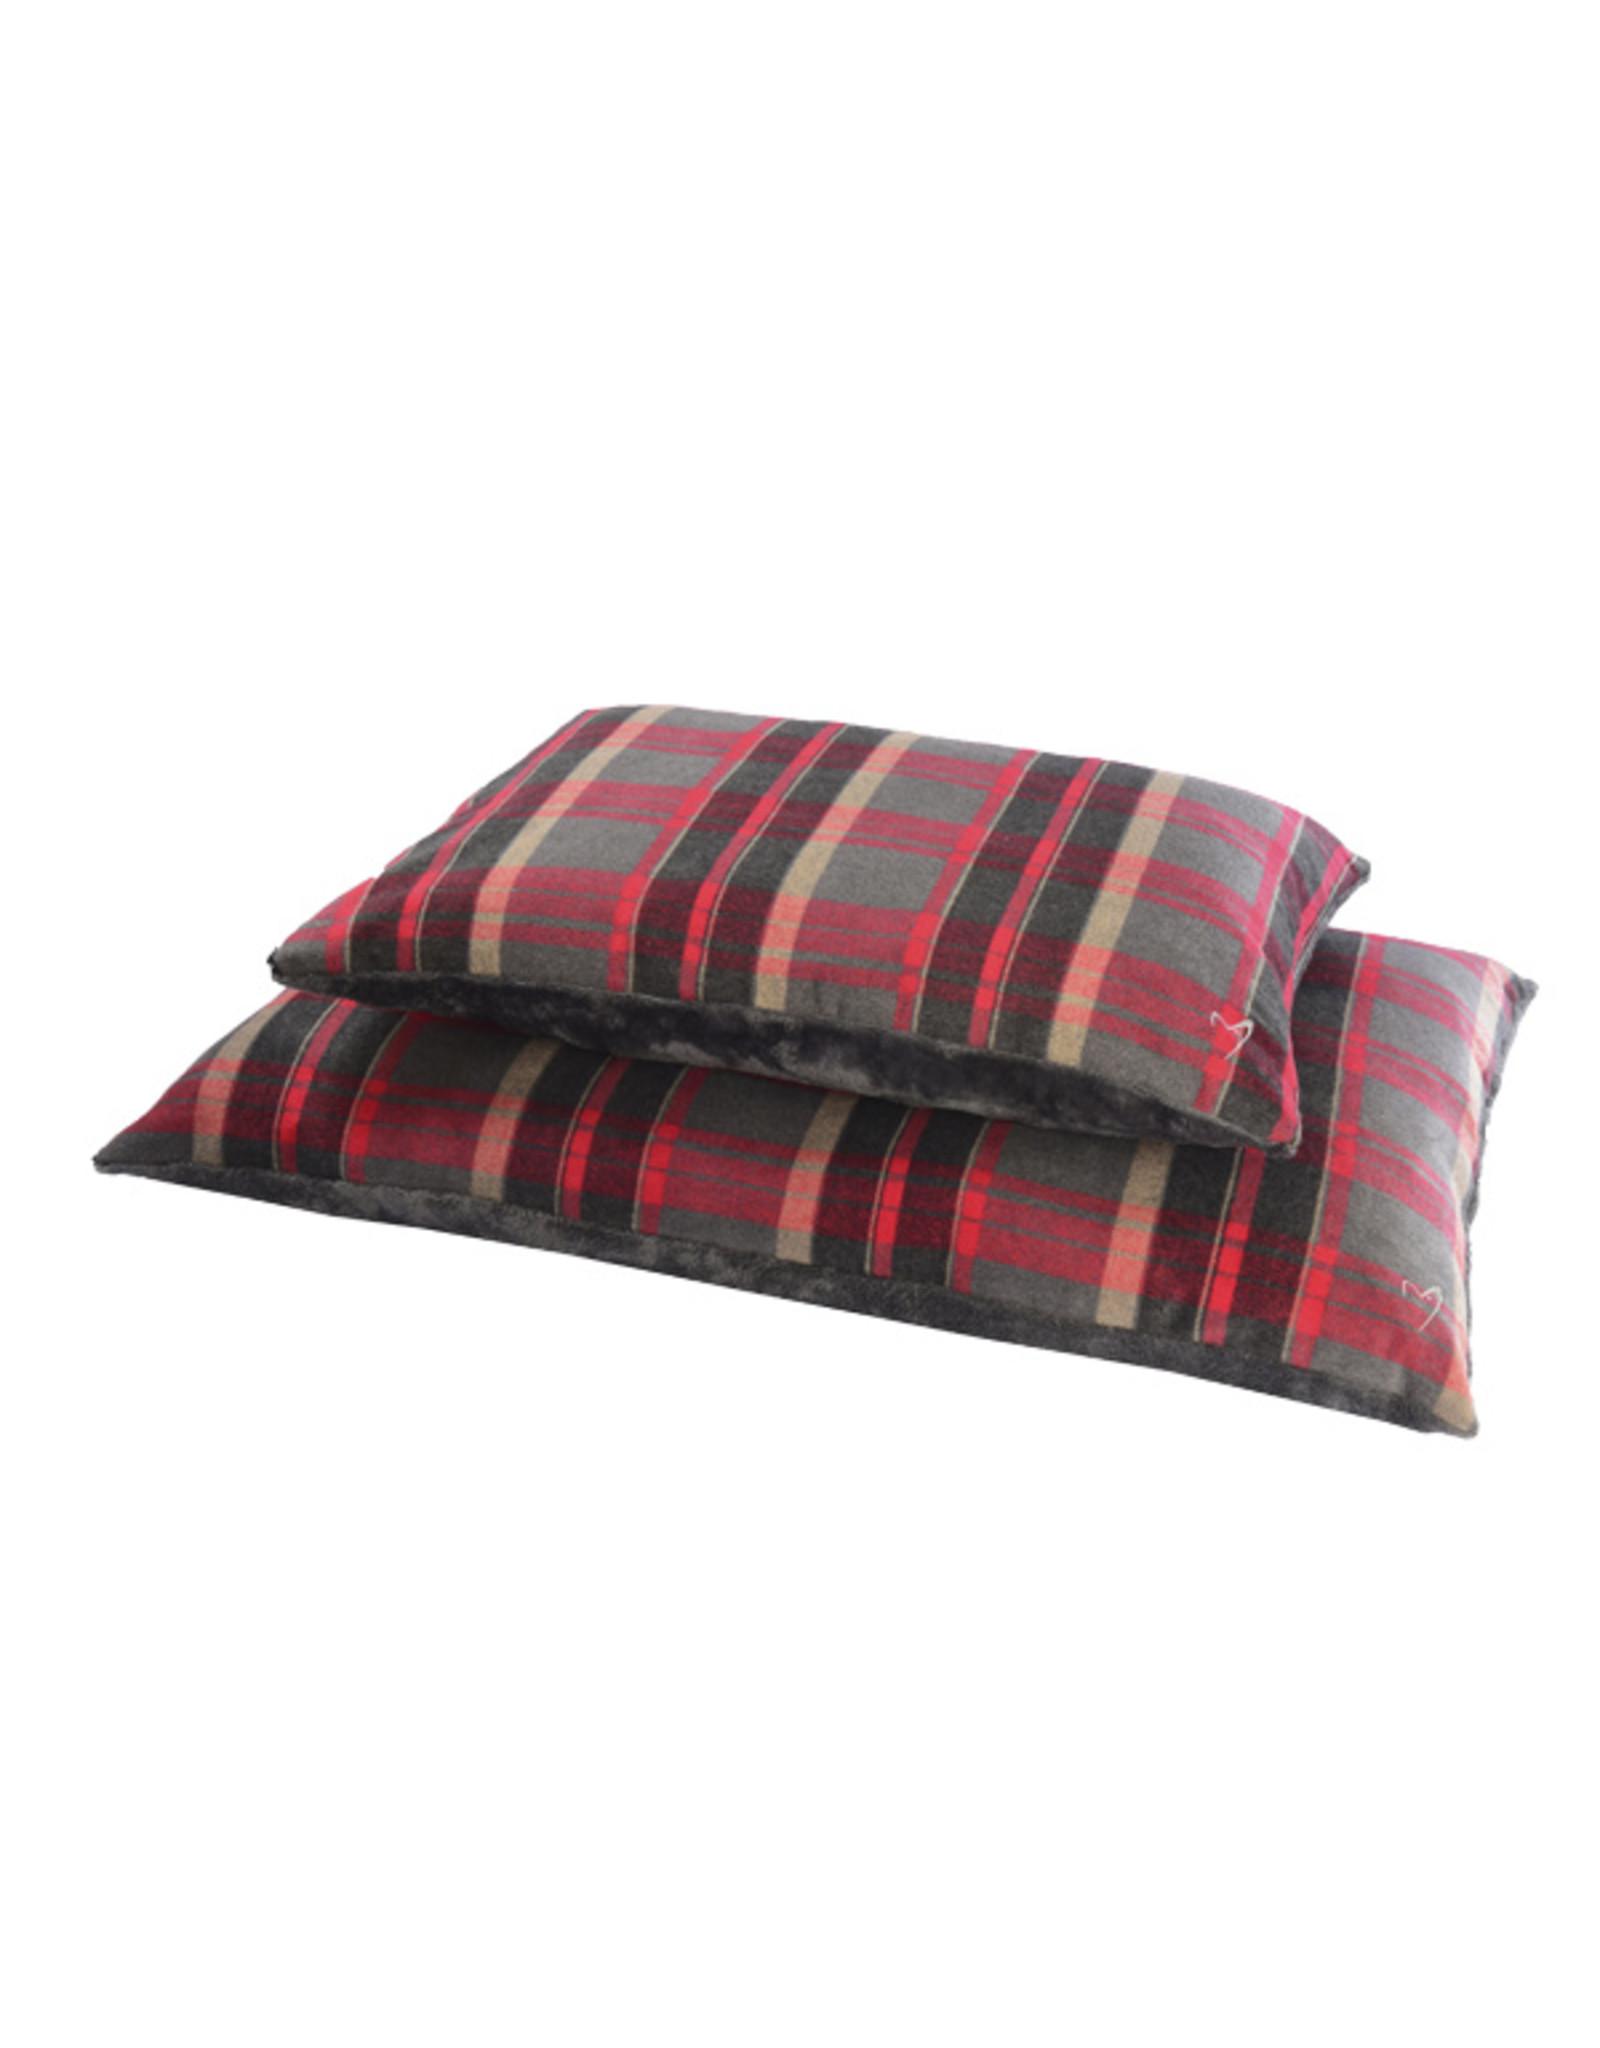 Gor Pets Camden Comfy Cushion Dog Bed, Medium 61x86cm